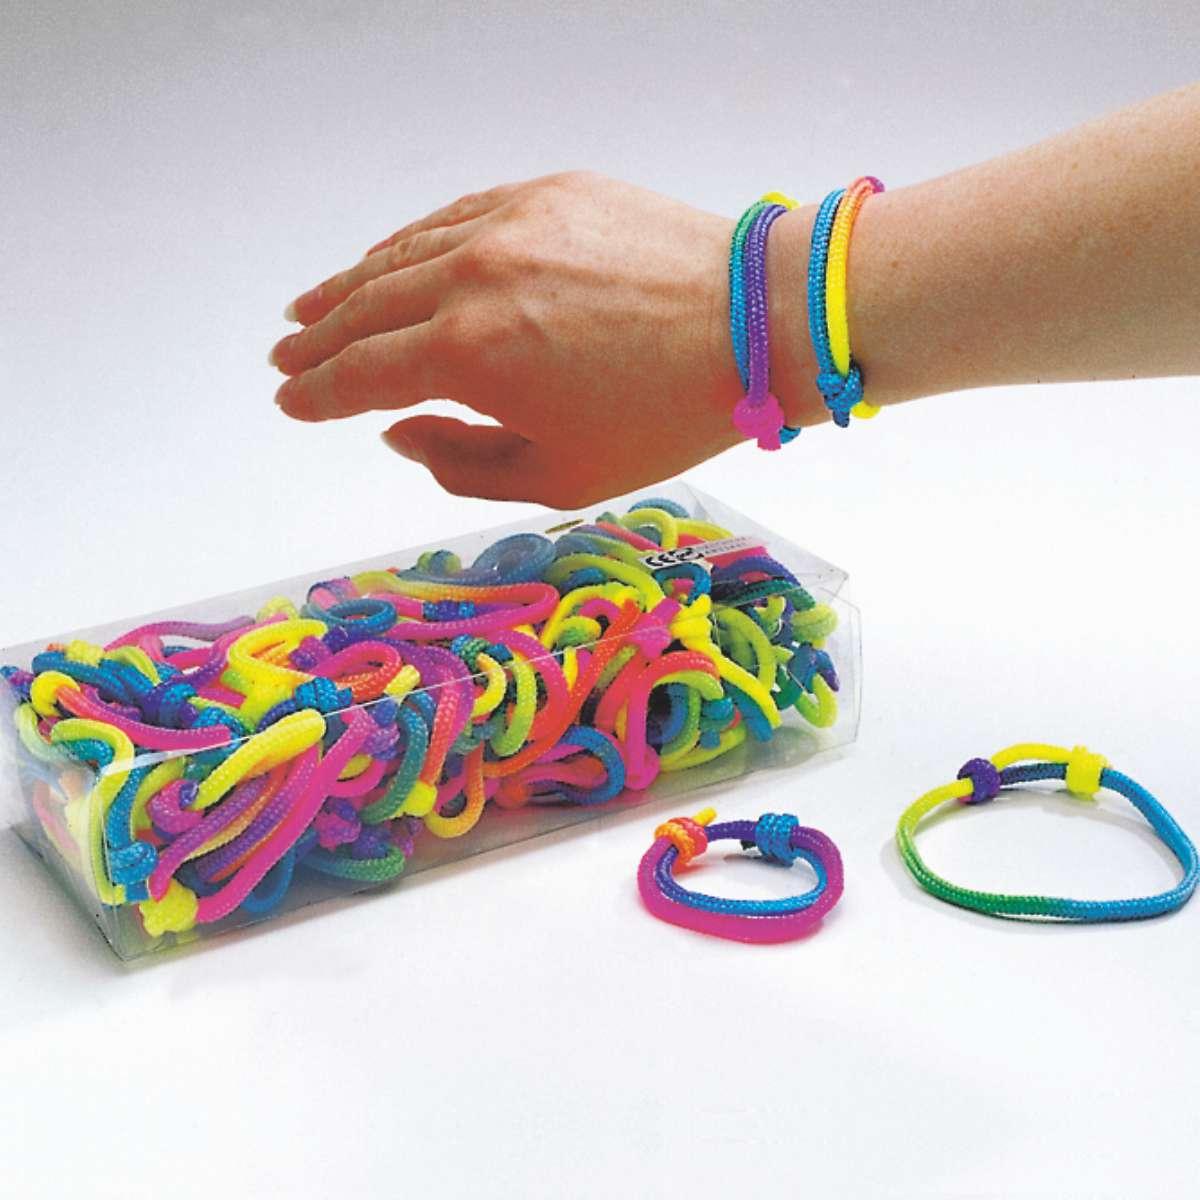 Neon-Armbänder